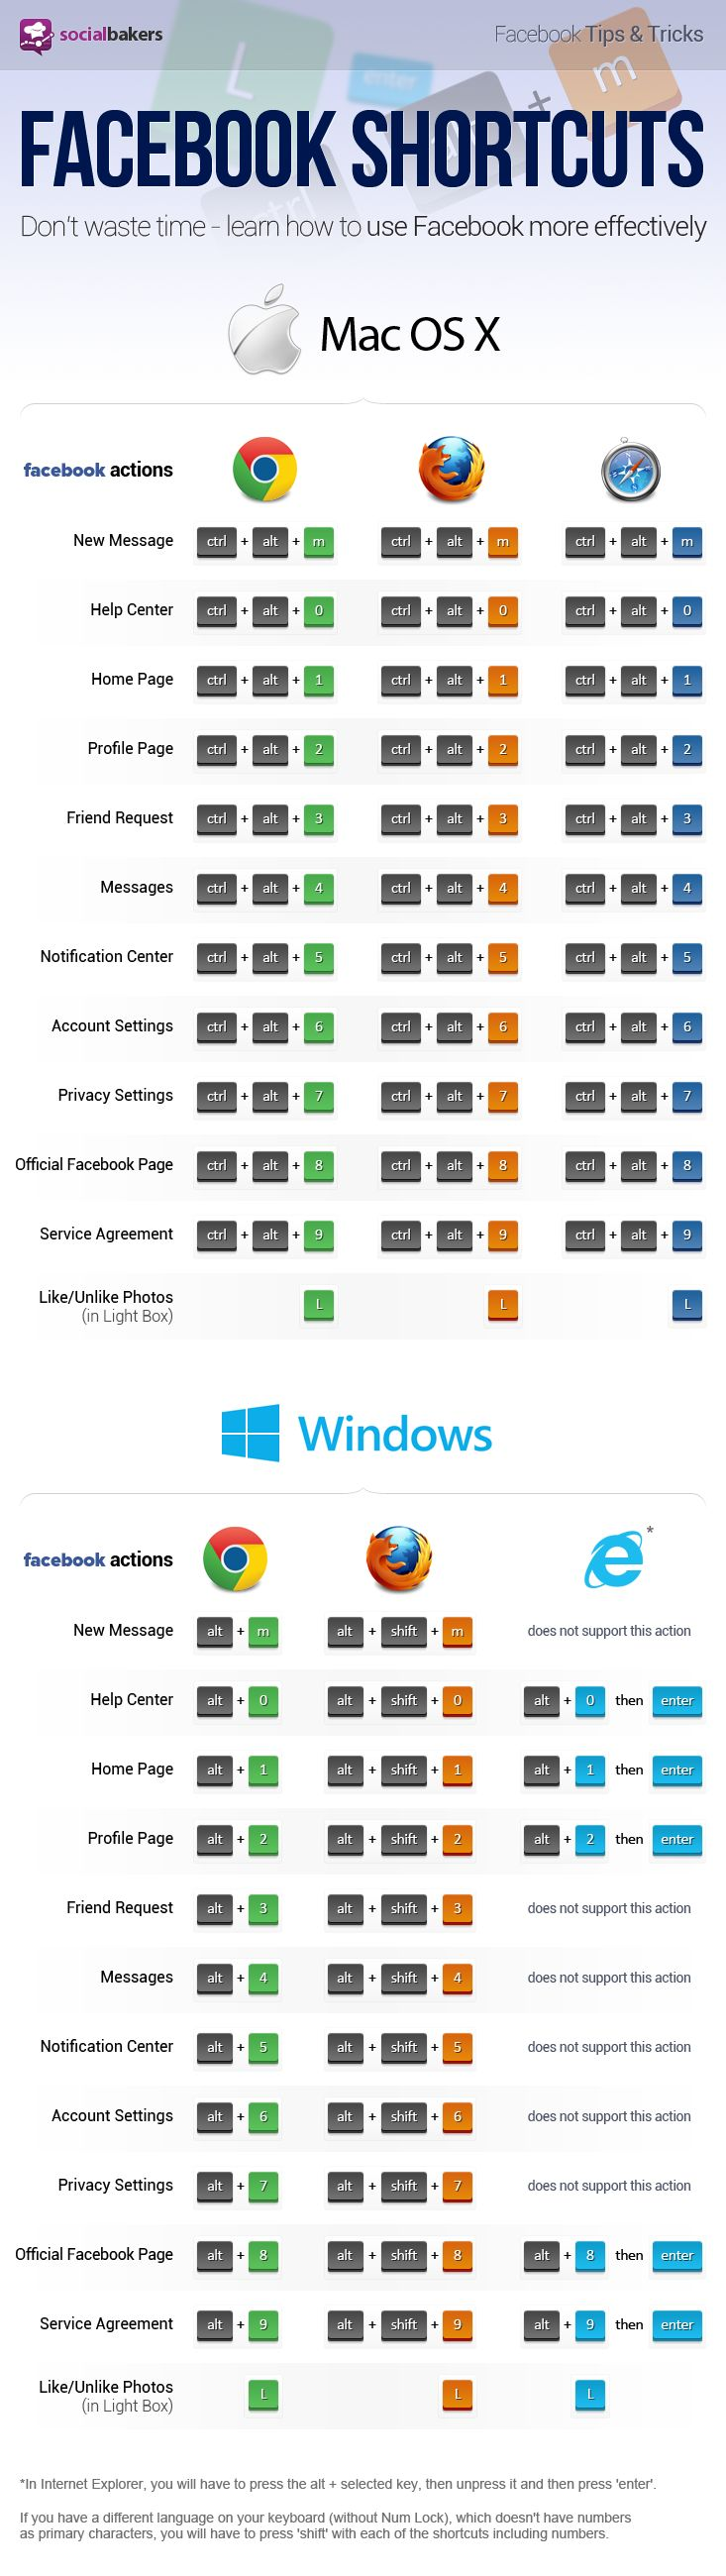 FaceBook shortcuts (Mac & Windows) #infographic